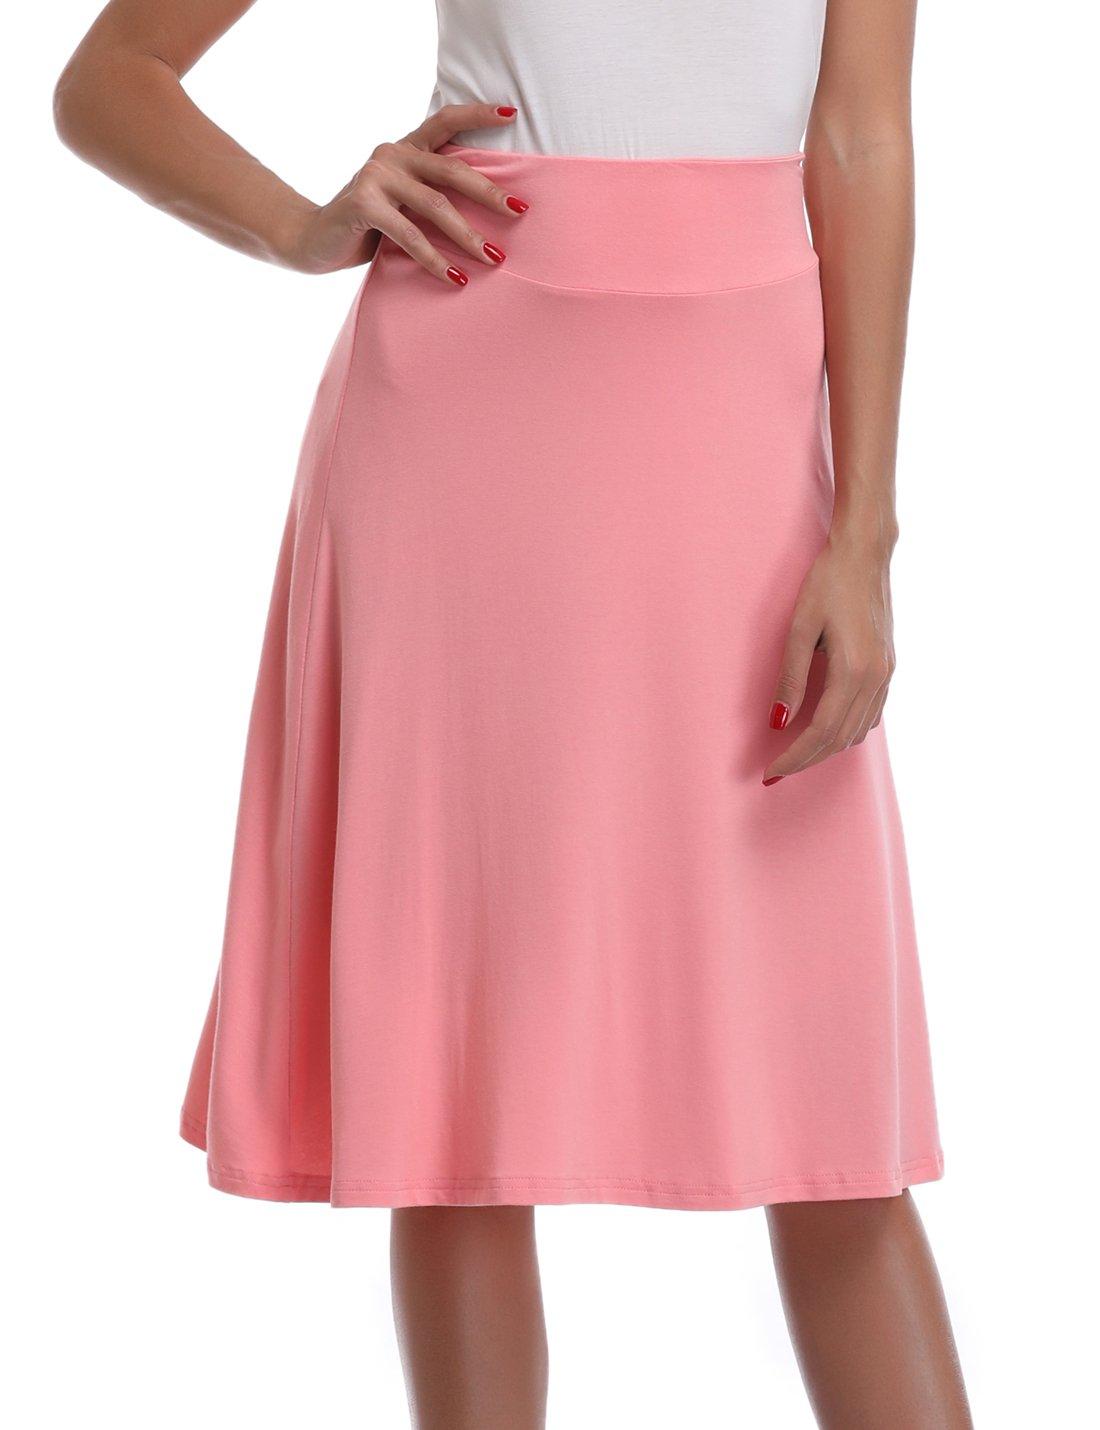 MISS MOLY Women's Pleated Flared Skater Knit Mid Calf Skirt High Waist A-line Midi Skirt